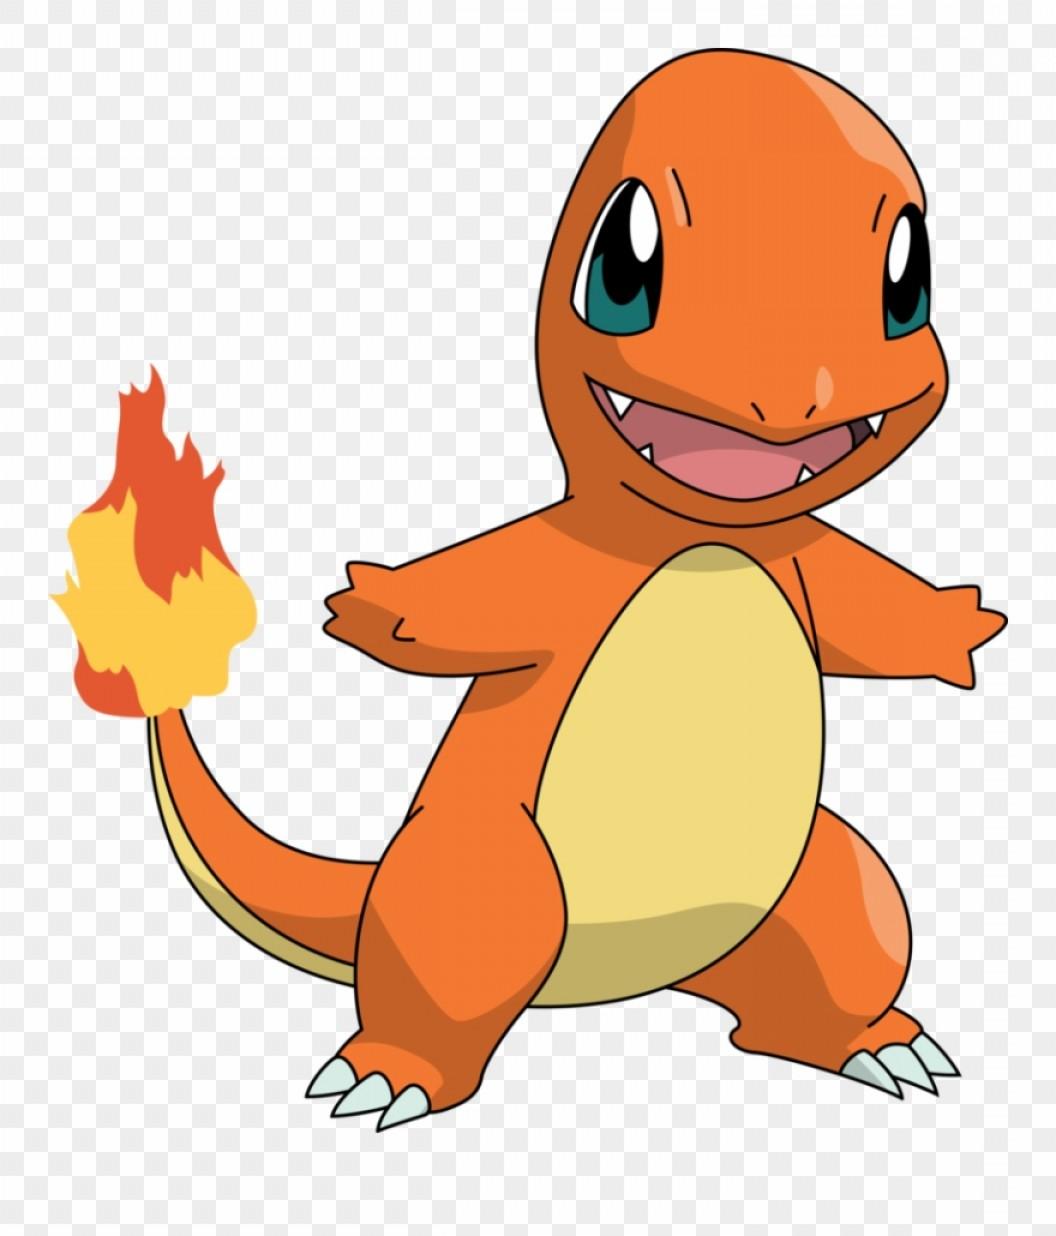 Ixxoihthug Clipart Charmander Pokemon Charmander Vector Png Download.